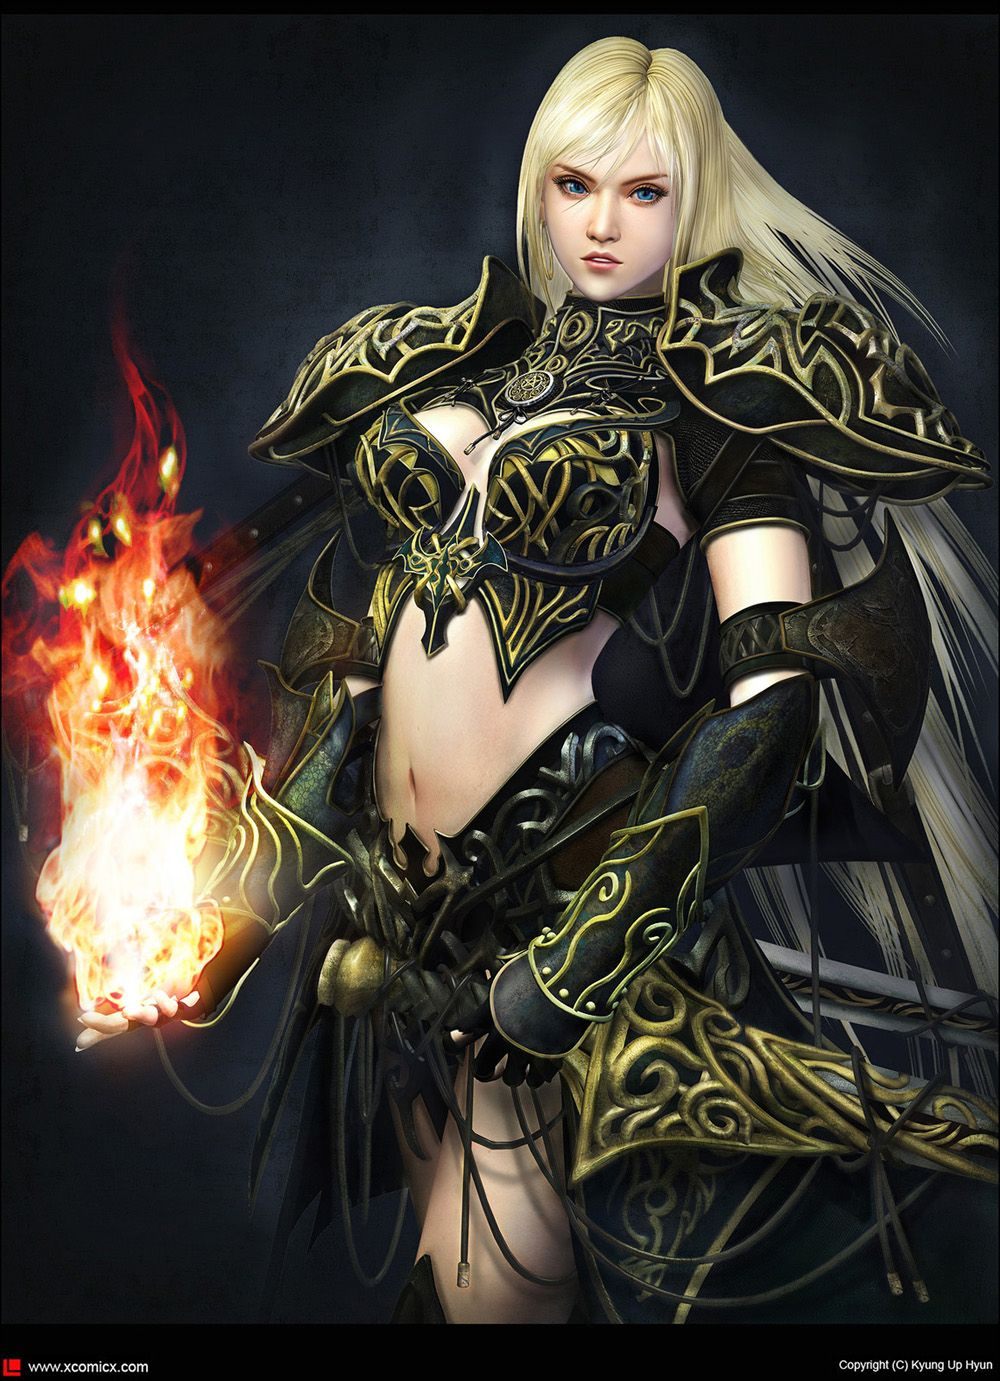 Warrior lady 3gp porncraft image